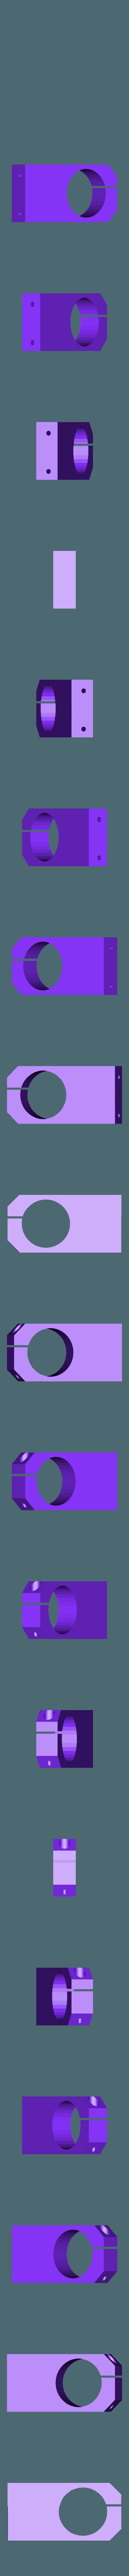 bottom_motor_mount-SMOKE.stl Télécharger fichier STL gratuit Ghostbuster Ghostbuster Ghosttrap • Modèle pour impression 3D, SLIDES